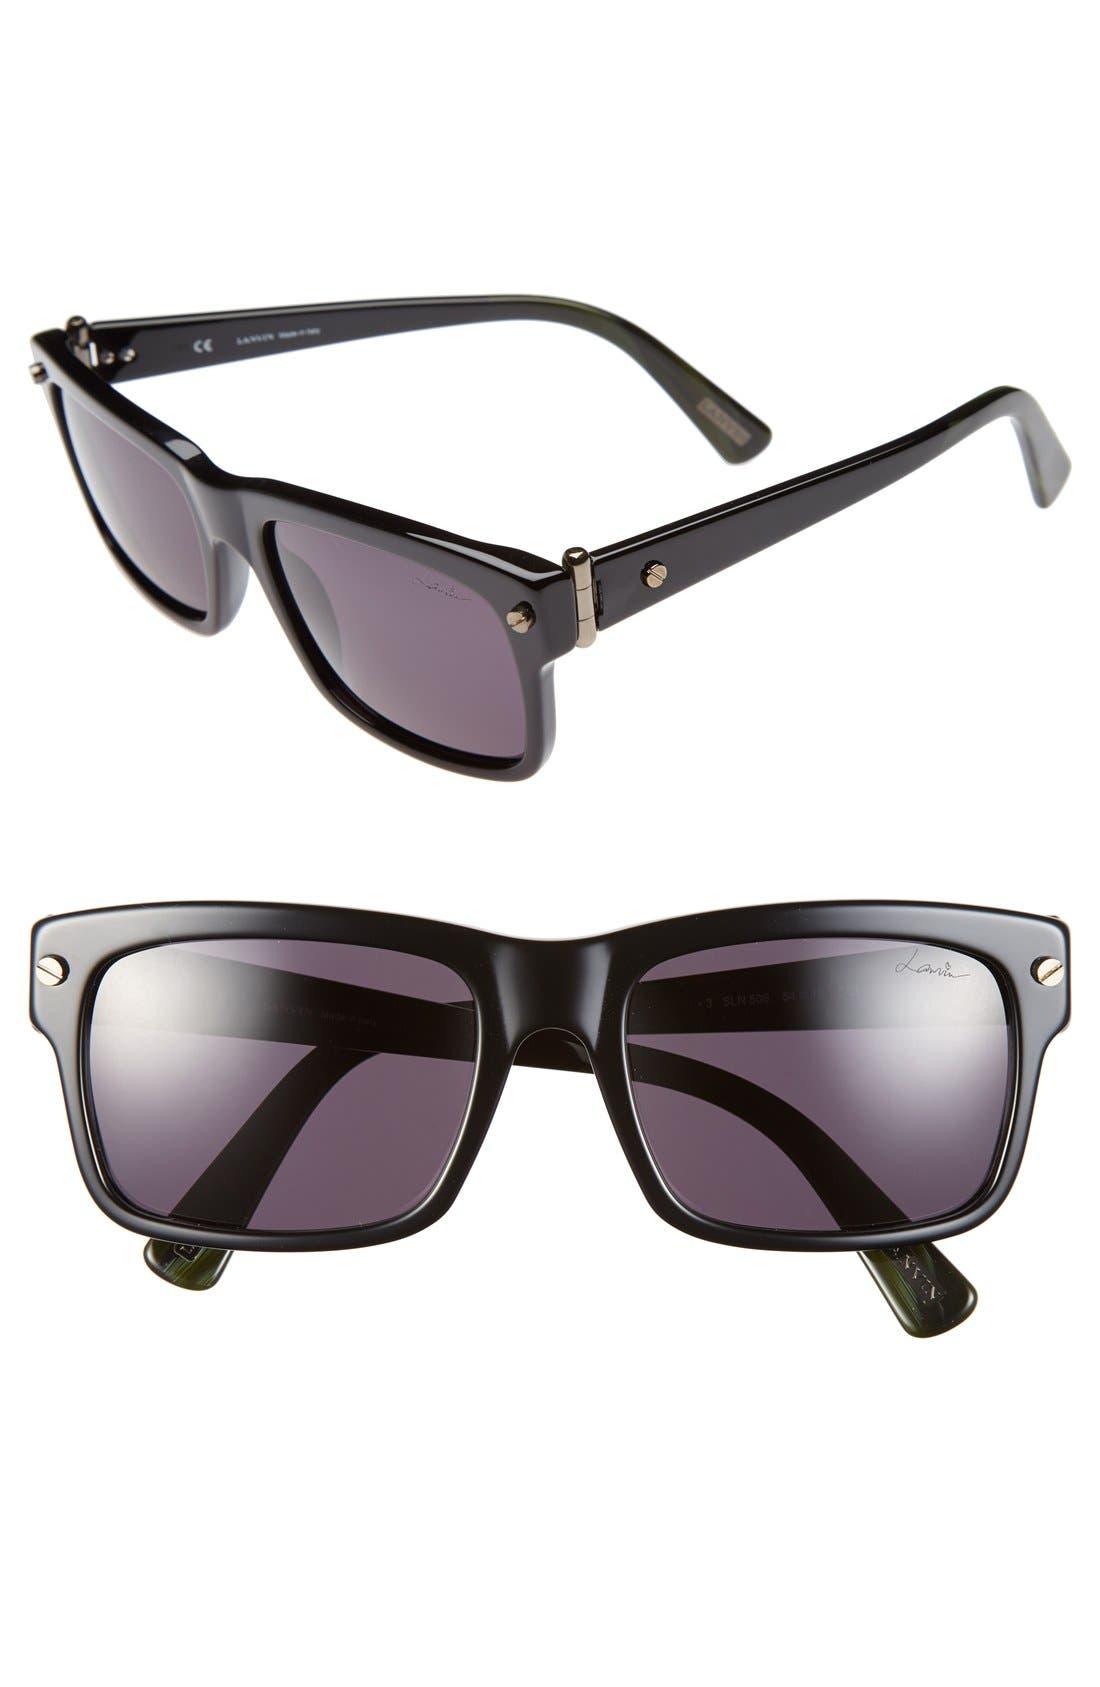 Main Image - Lanvin 54mm Polarized Sunglasses